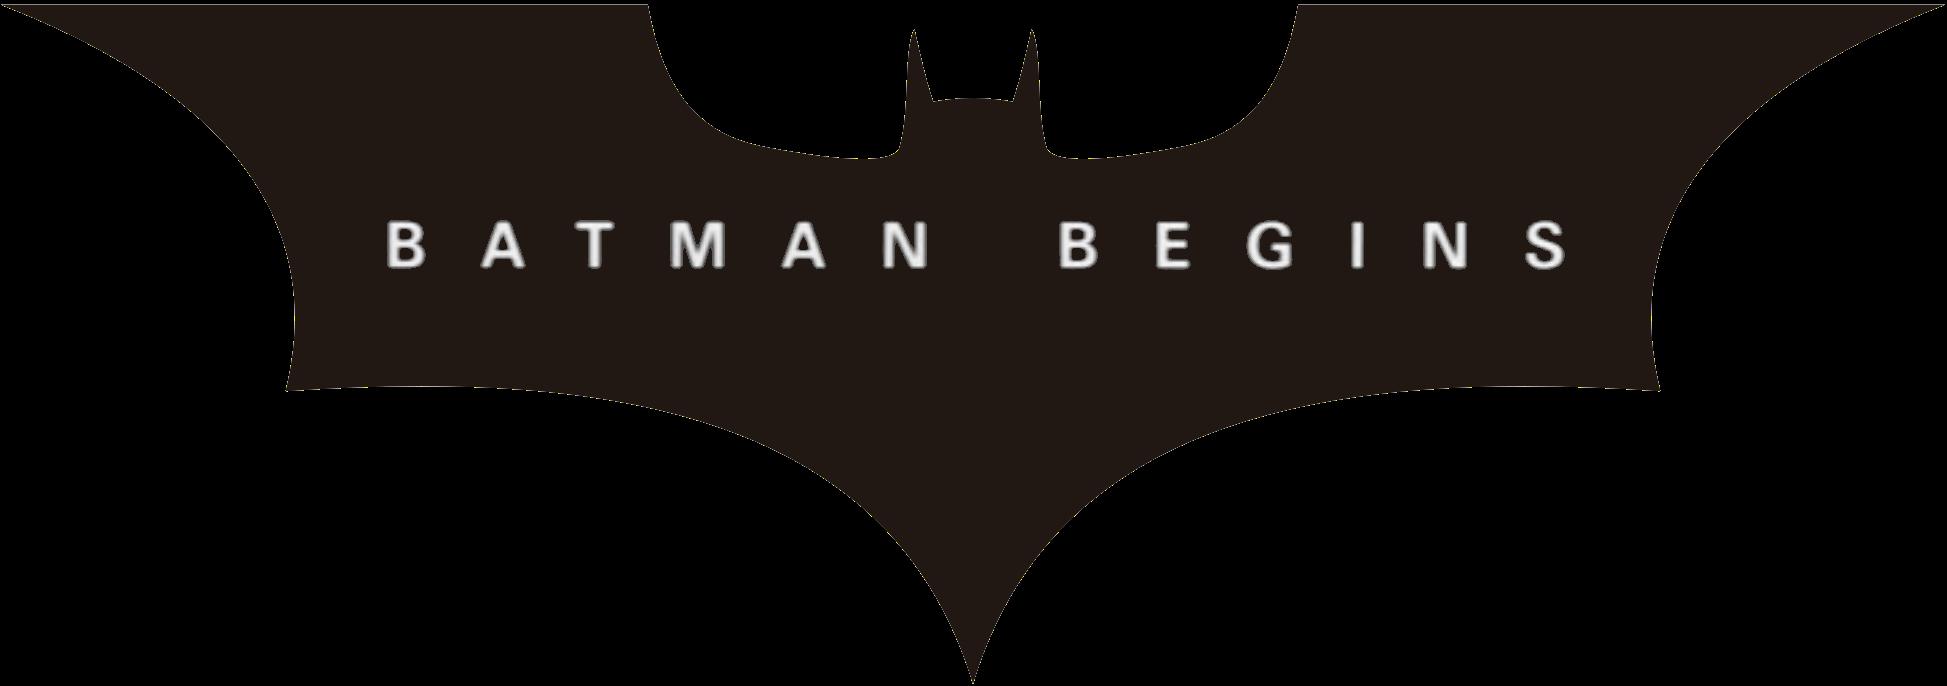 image batman begins logopng leonhartimvu wiki